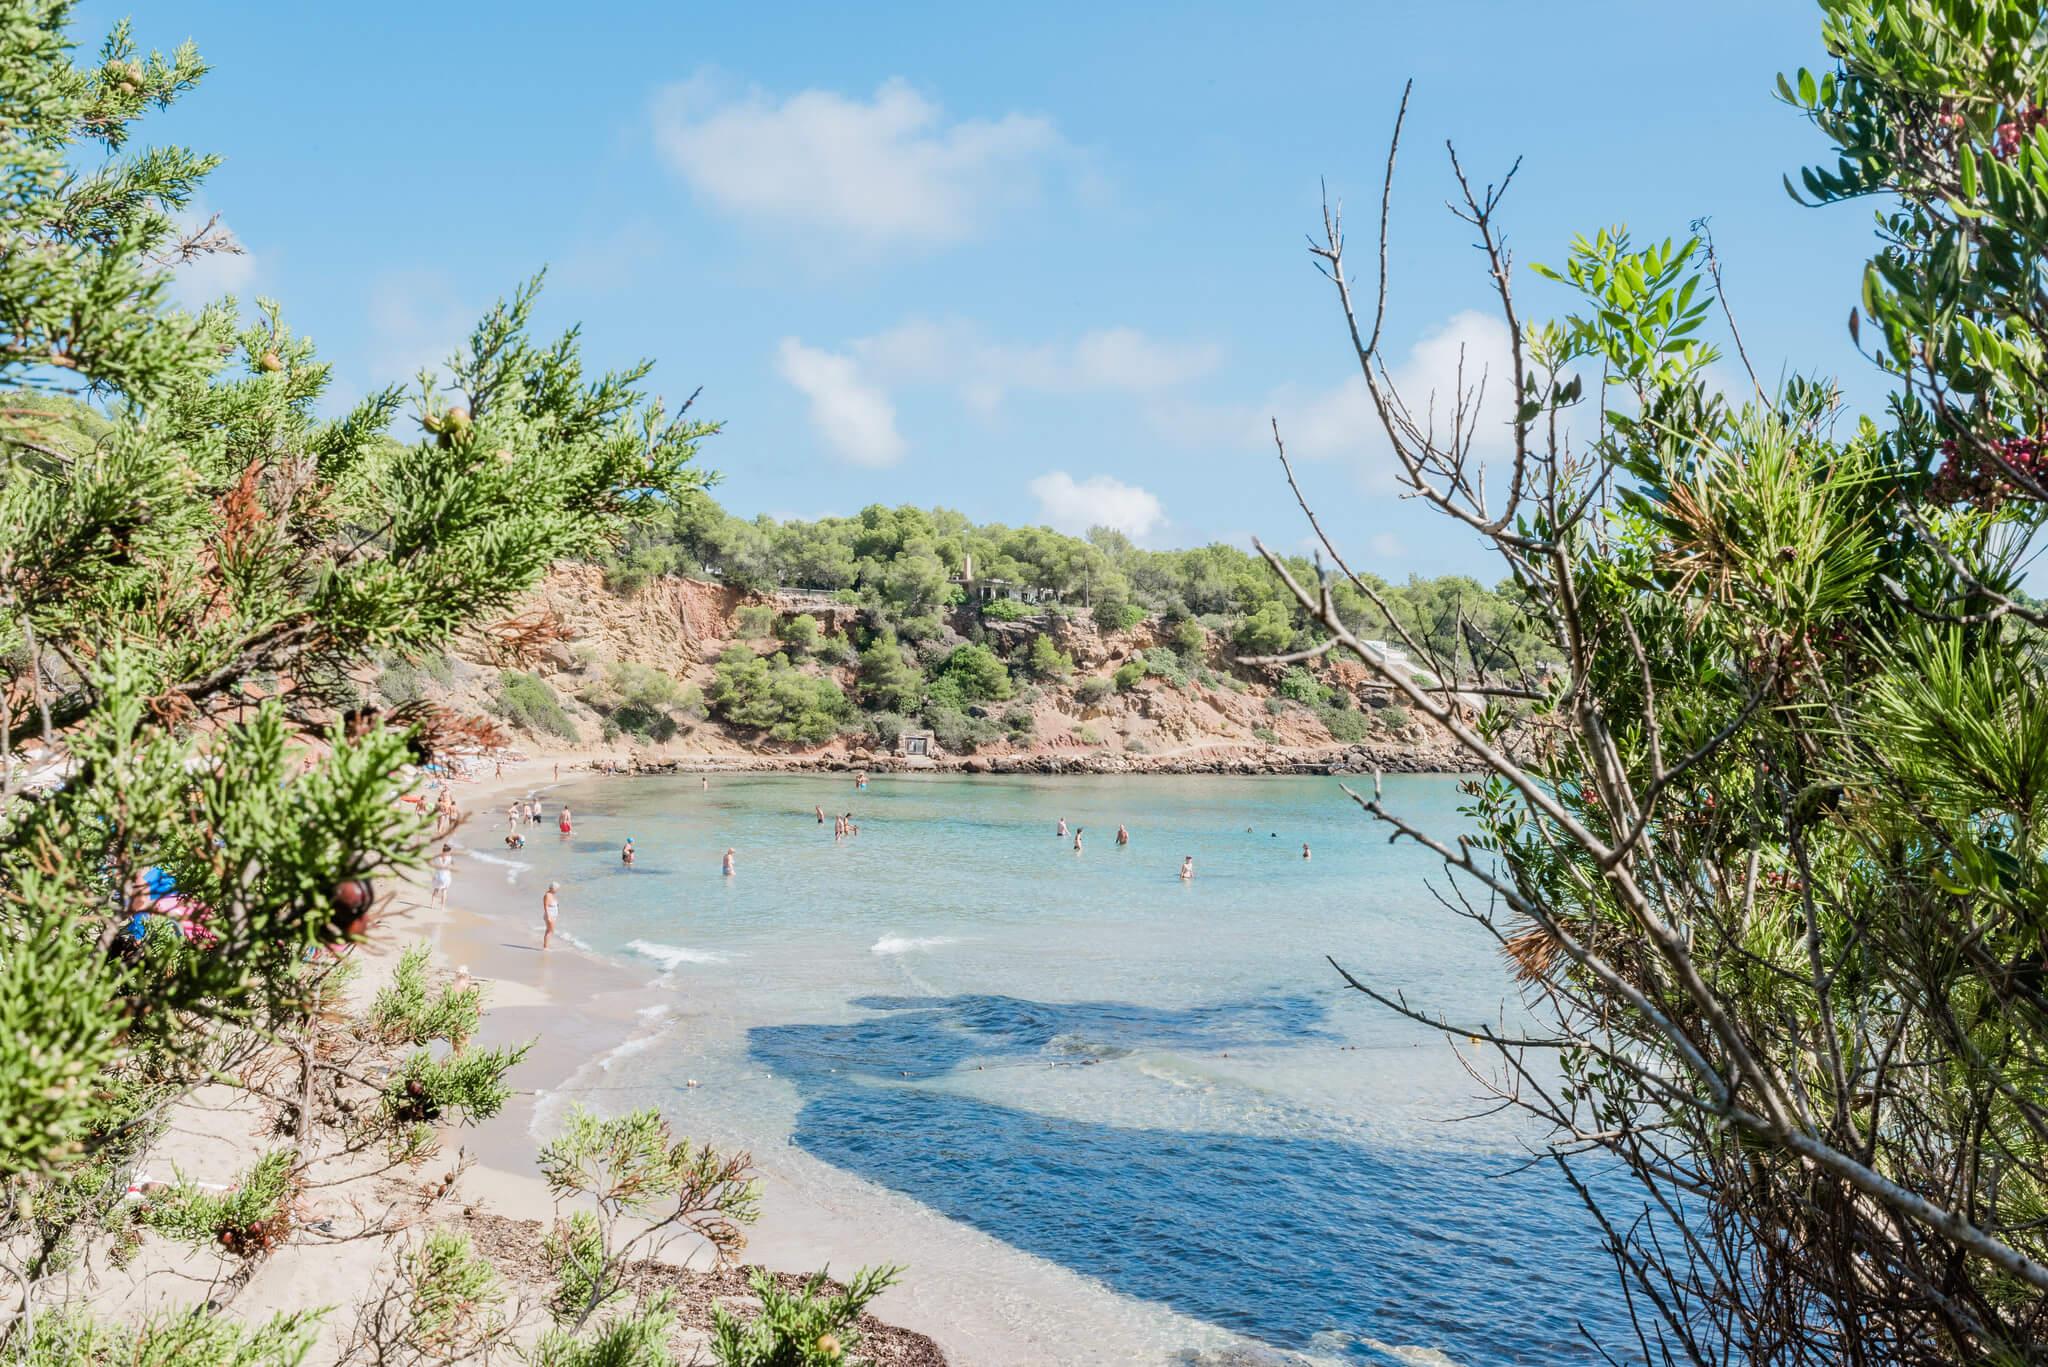 https://www.white-ibiza.com/wp-content/uploads/2020/03/ibiza-beaches-cala-llenya-03.jpg